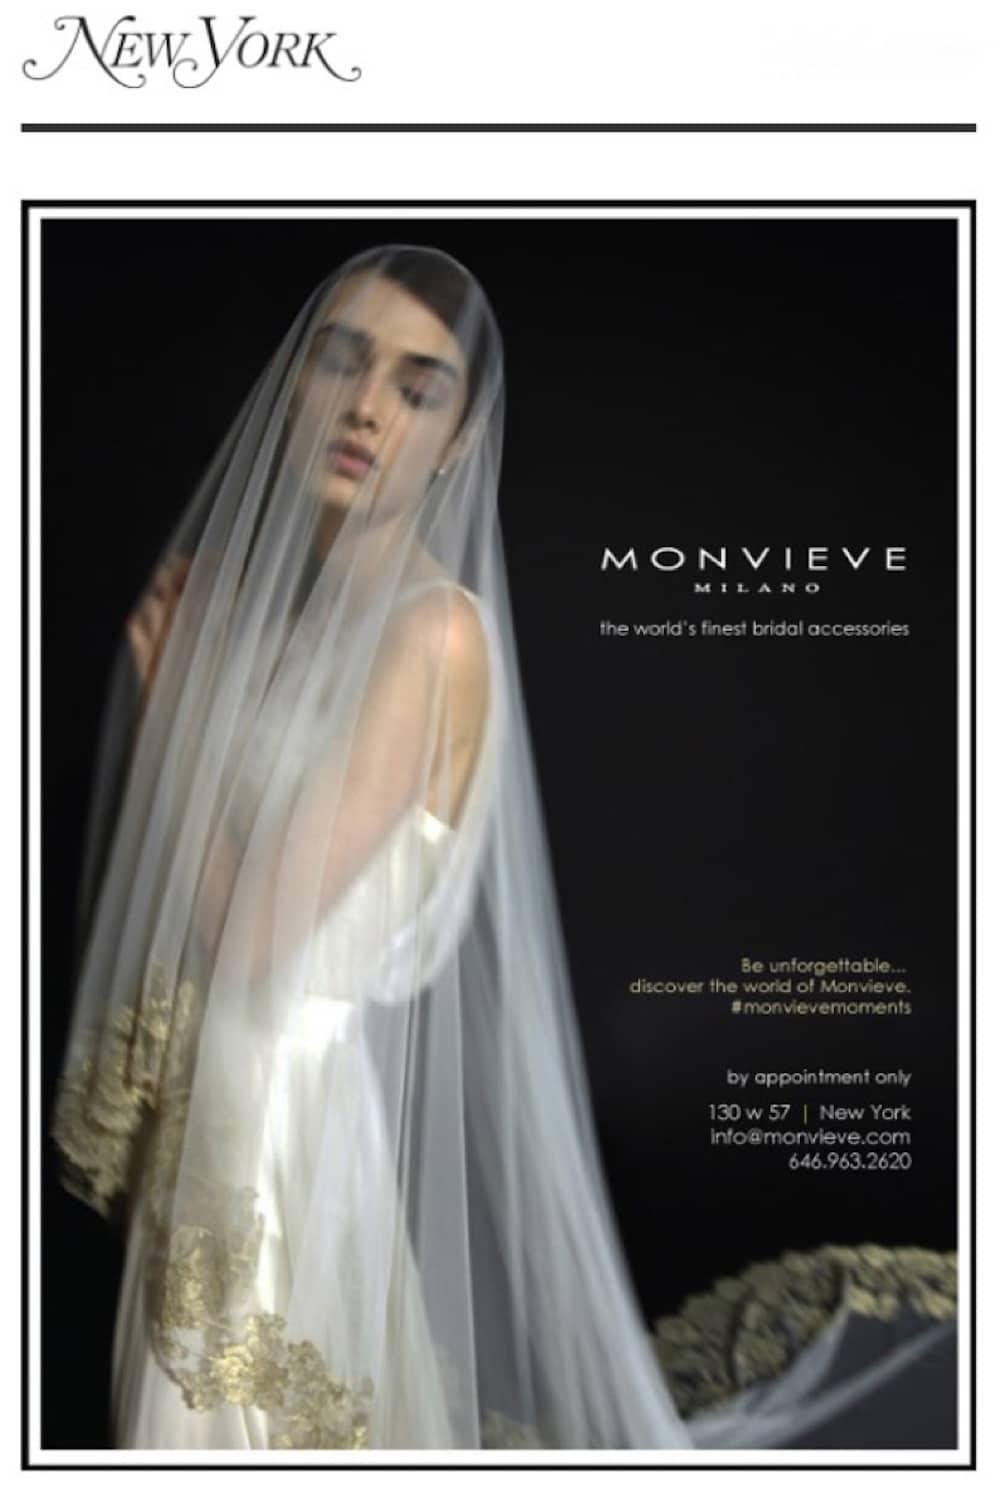 monvieve_campains_7